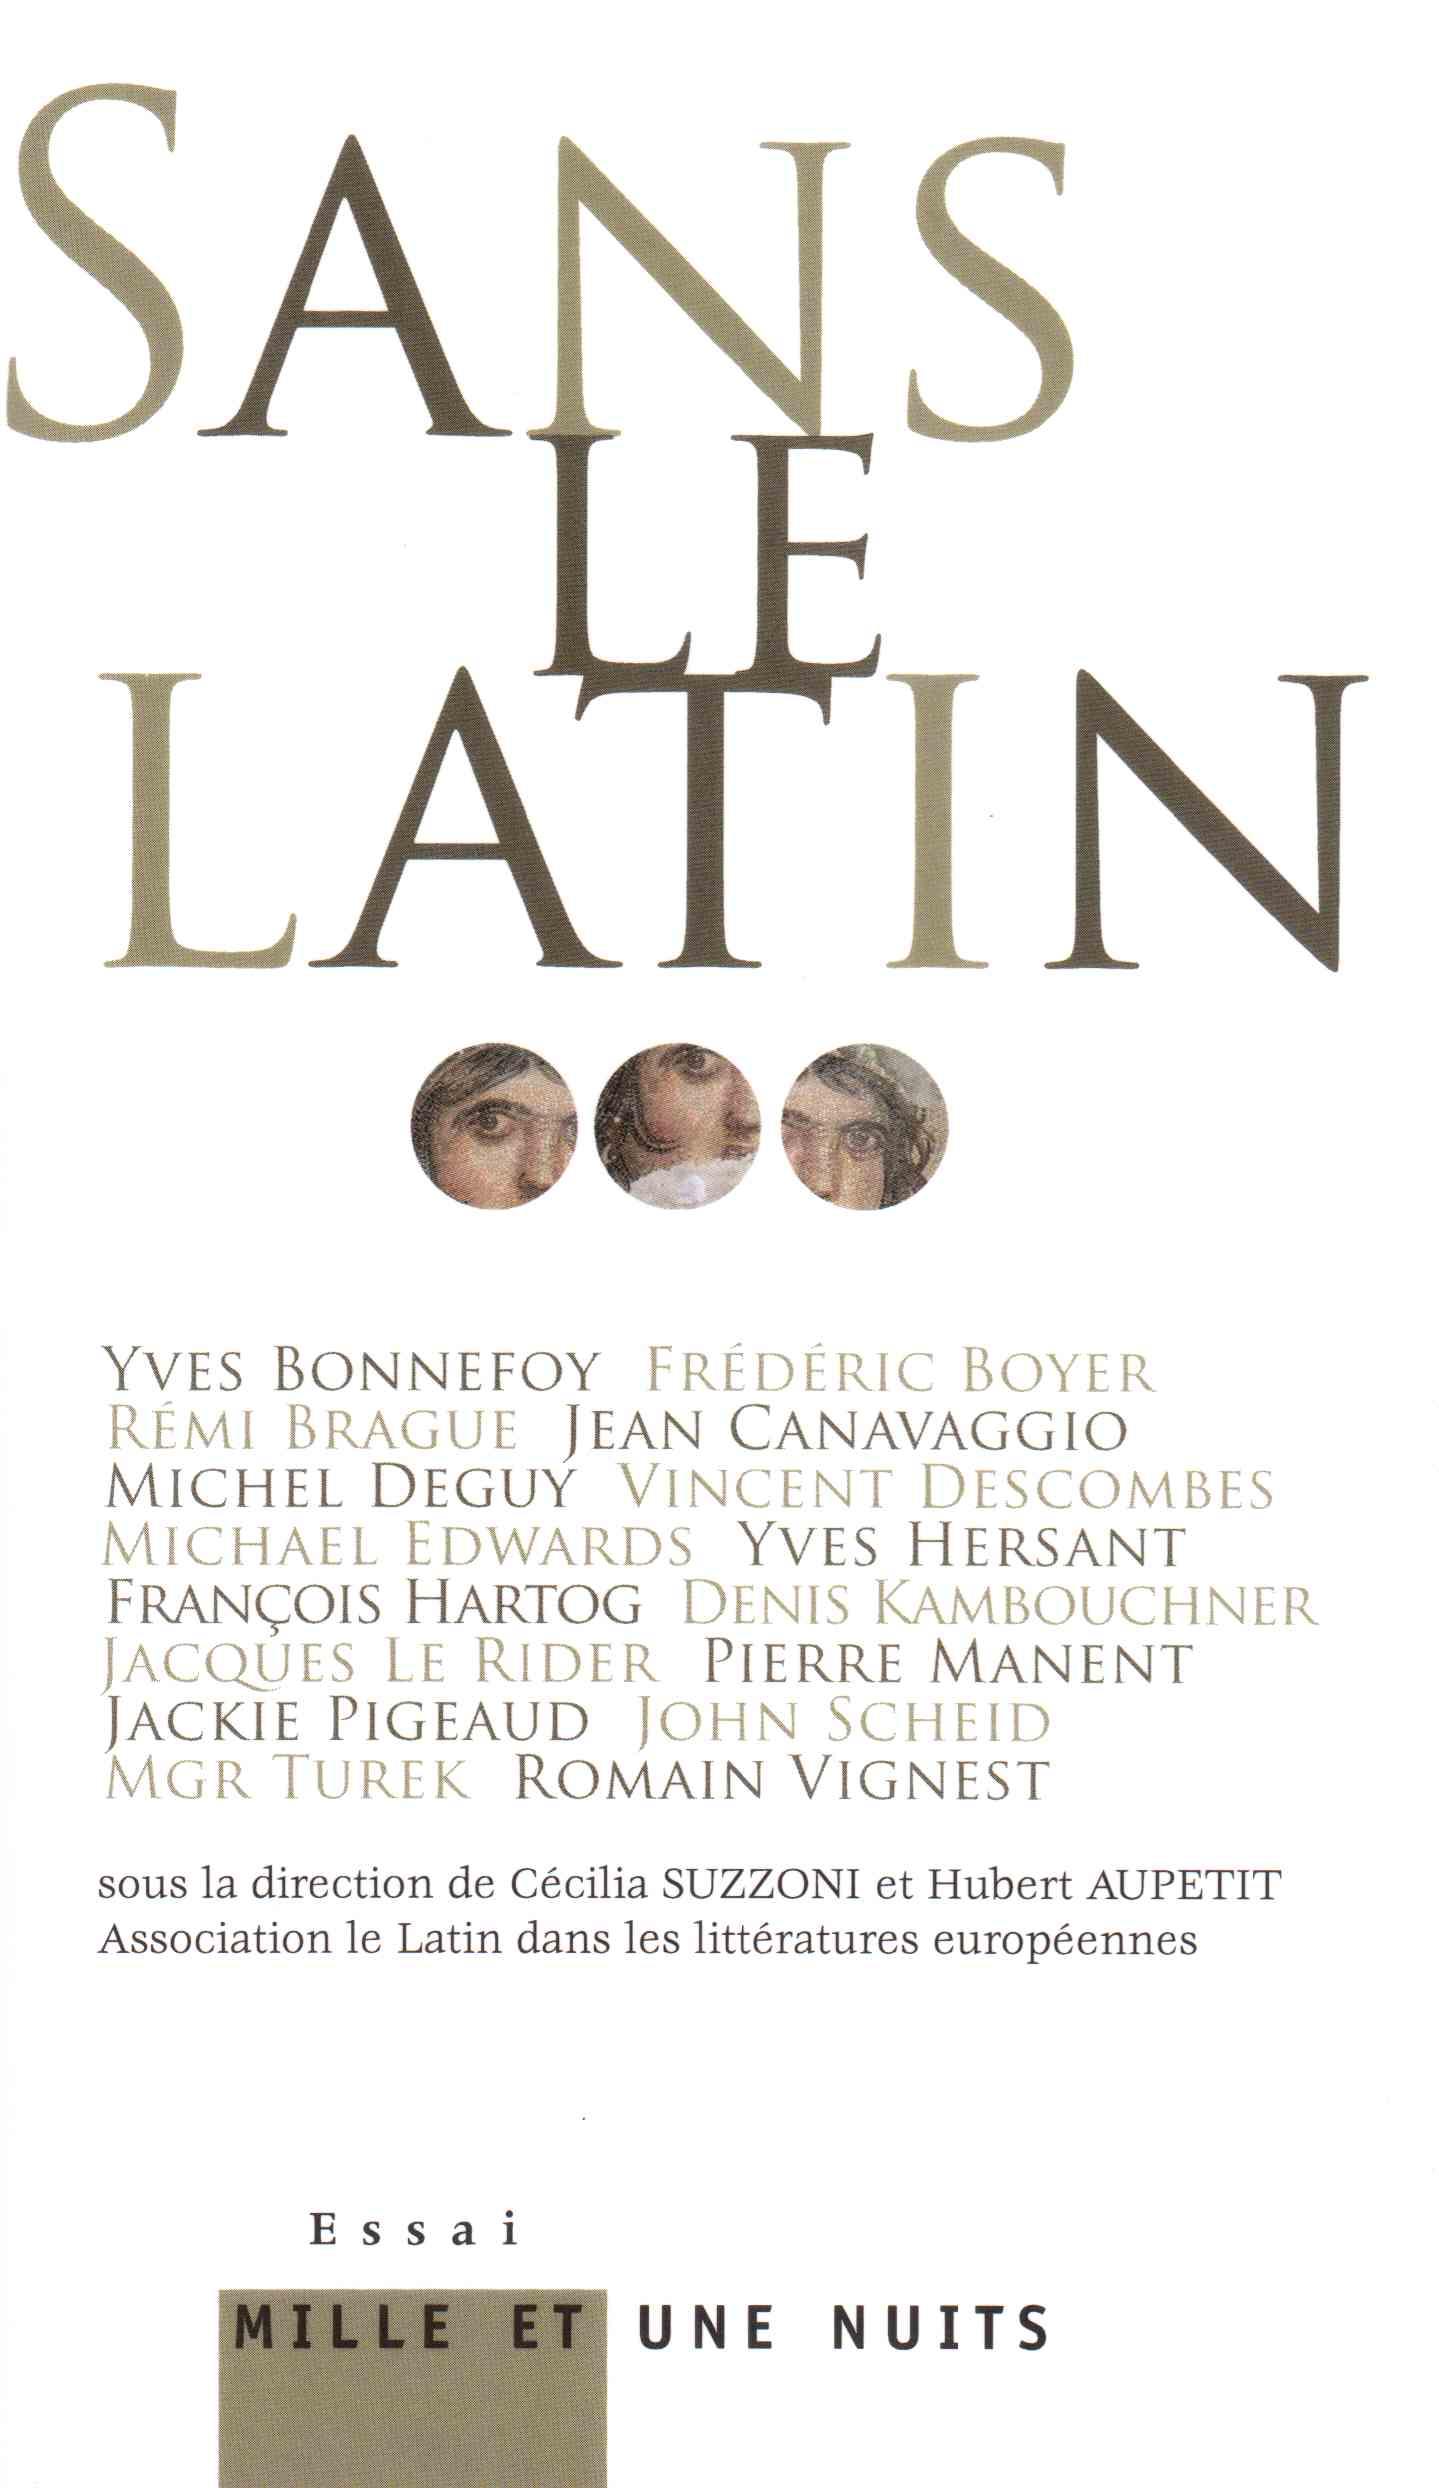 4 manires de apprendre parler le latin - wikiHow